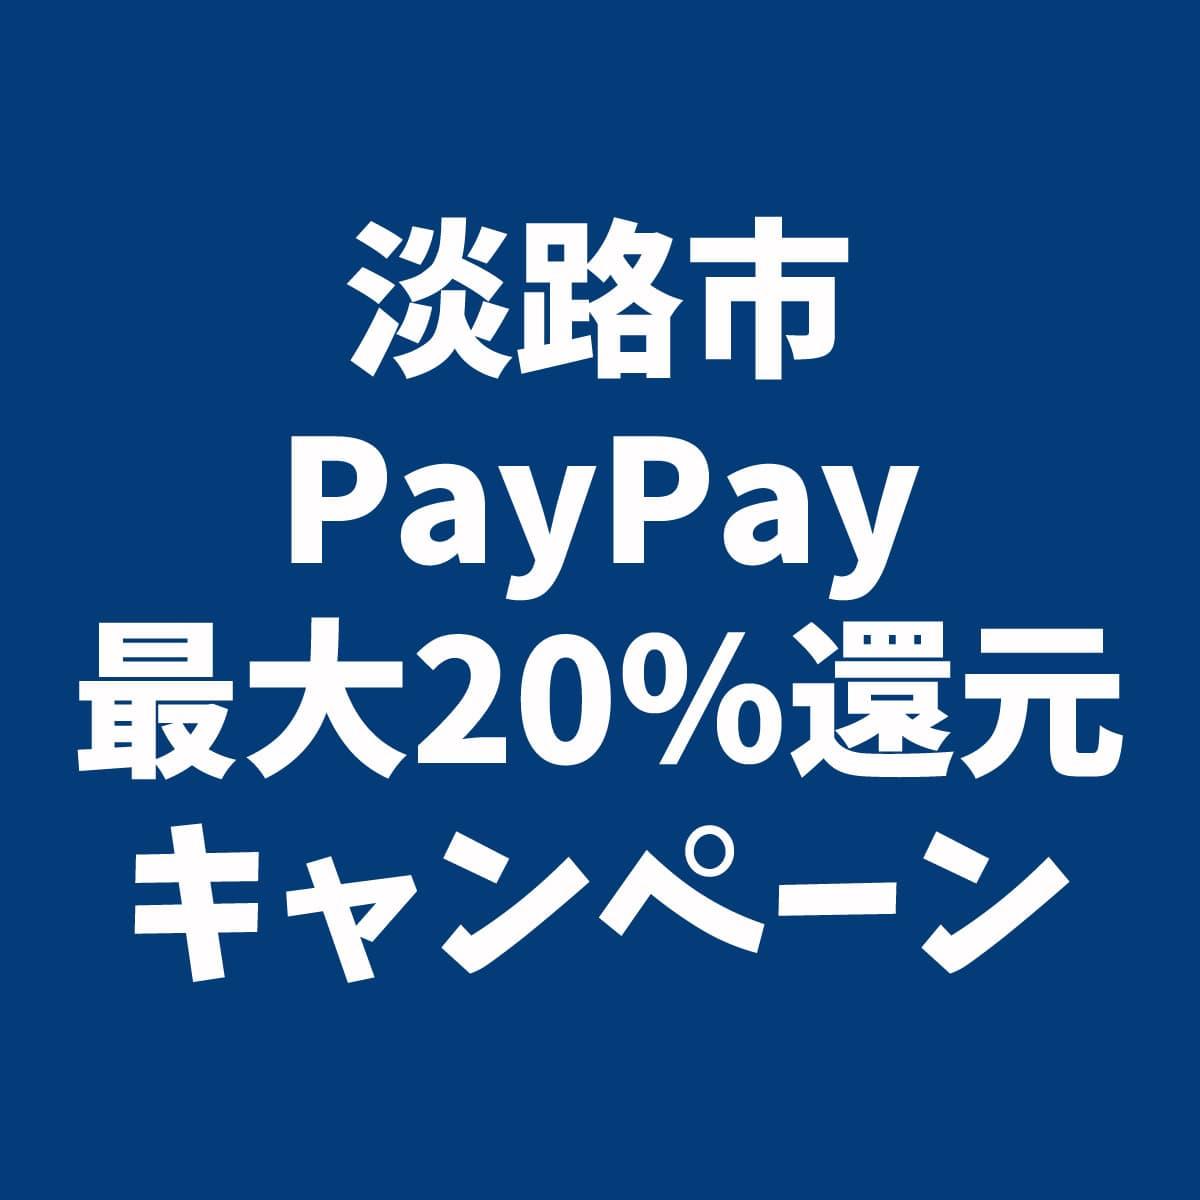 PayPay(ペイペイ)最大20%還元キャンペーン 淡路市